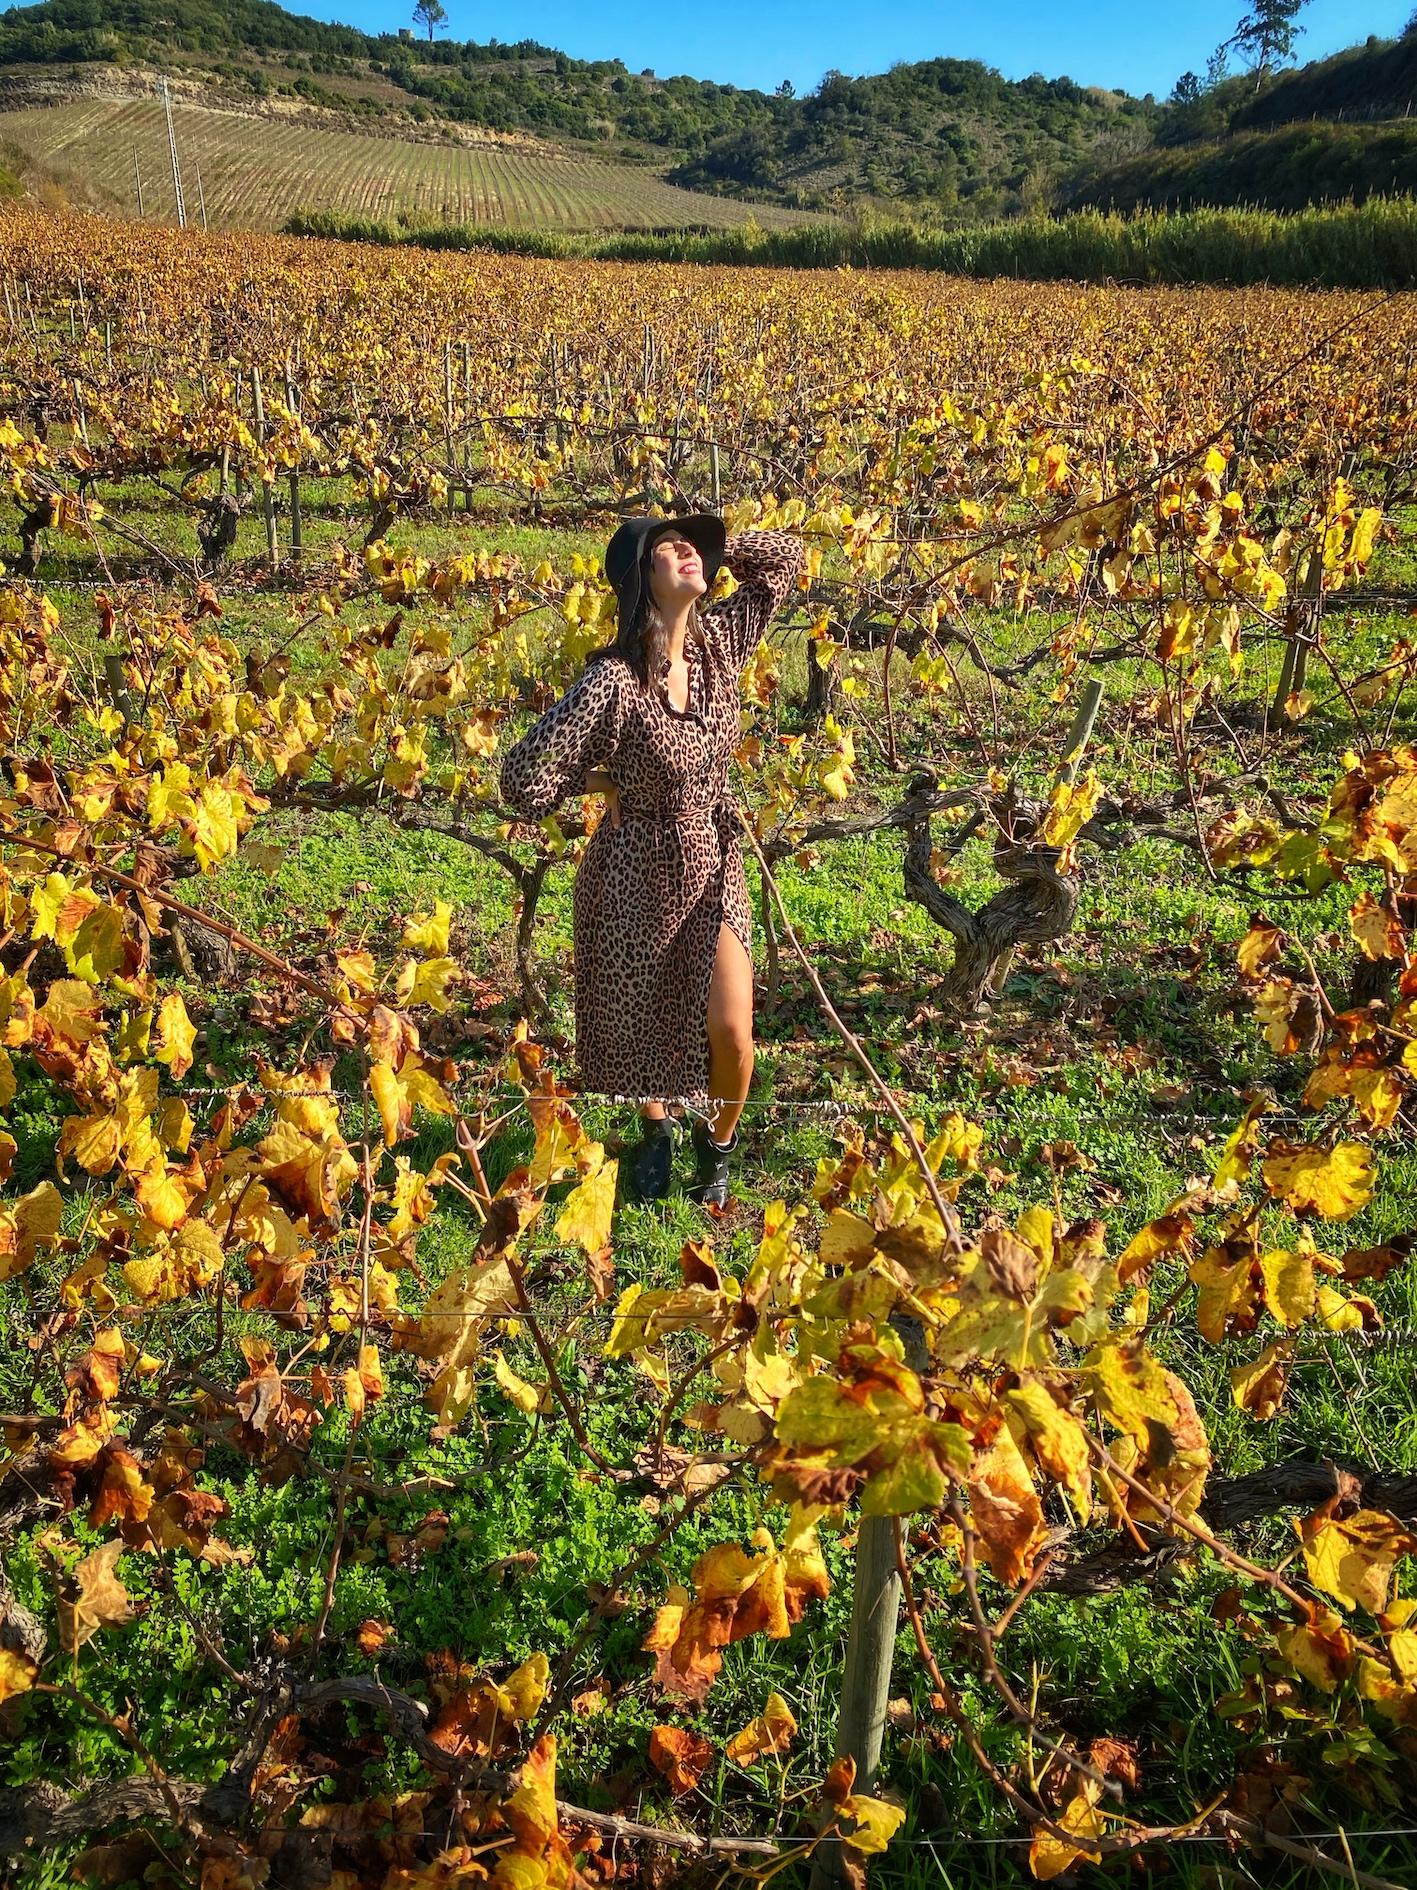 vinhos de lisboa